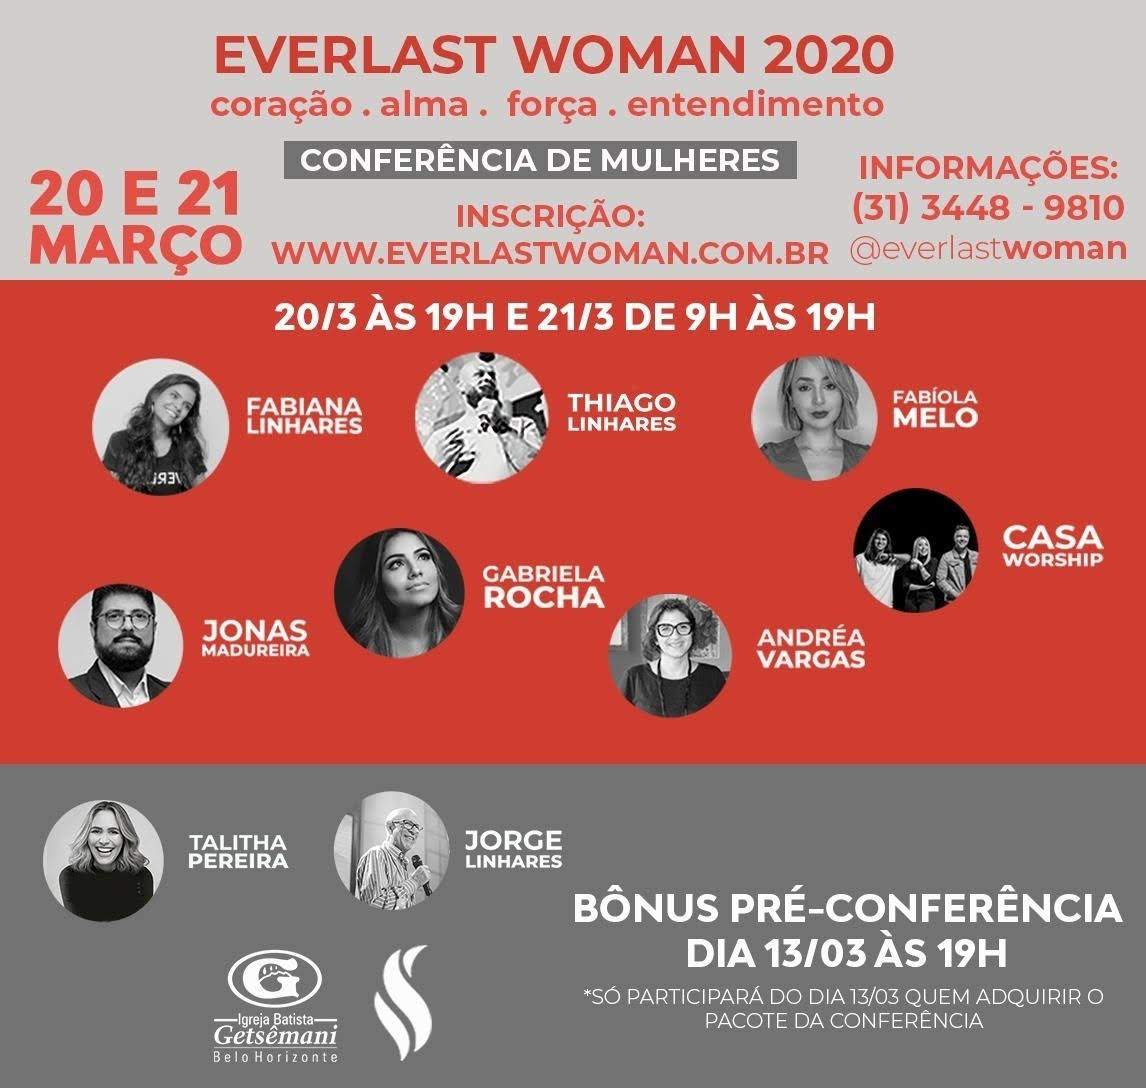 Conferência Everlast Woman 2020